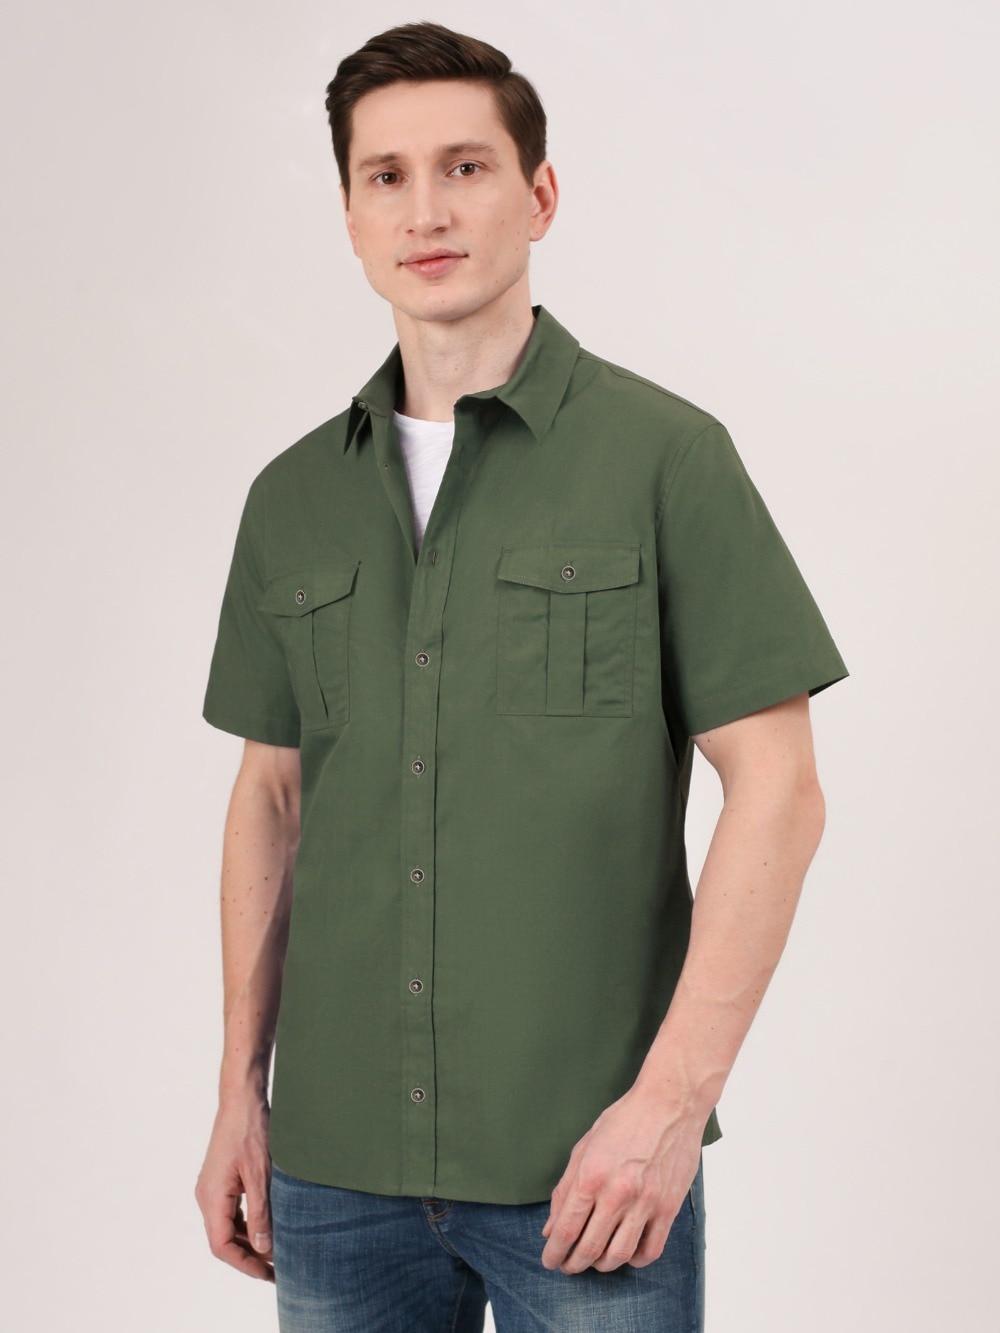 Фото - tom farr shirts for men T M7004.47 2018 new vintage men s messenger bags canvas shoulder bag fashion men business crossbody printing travel small handbag